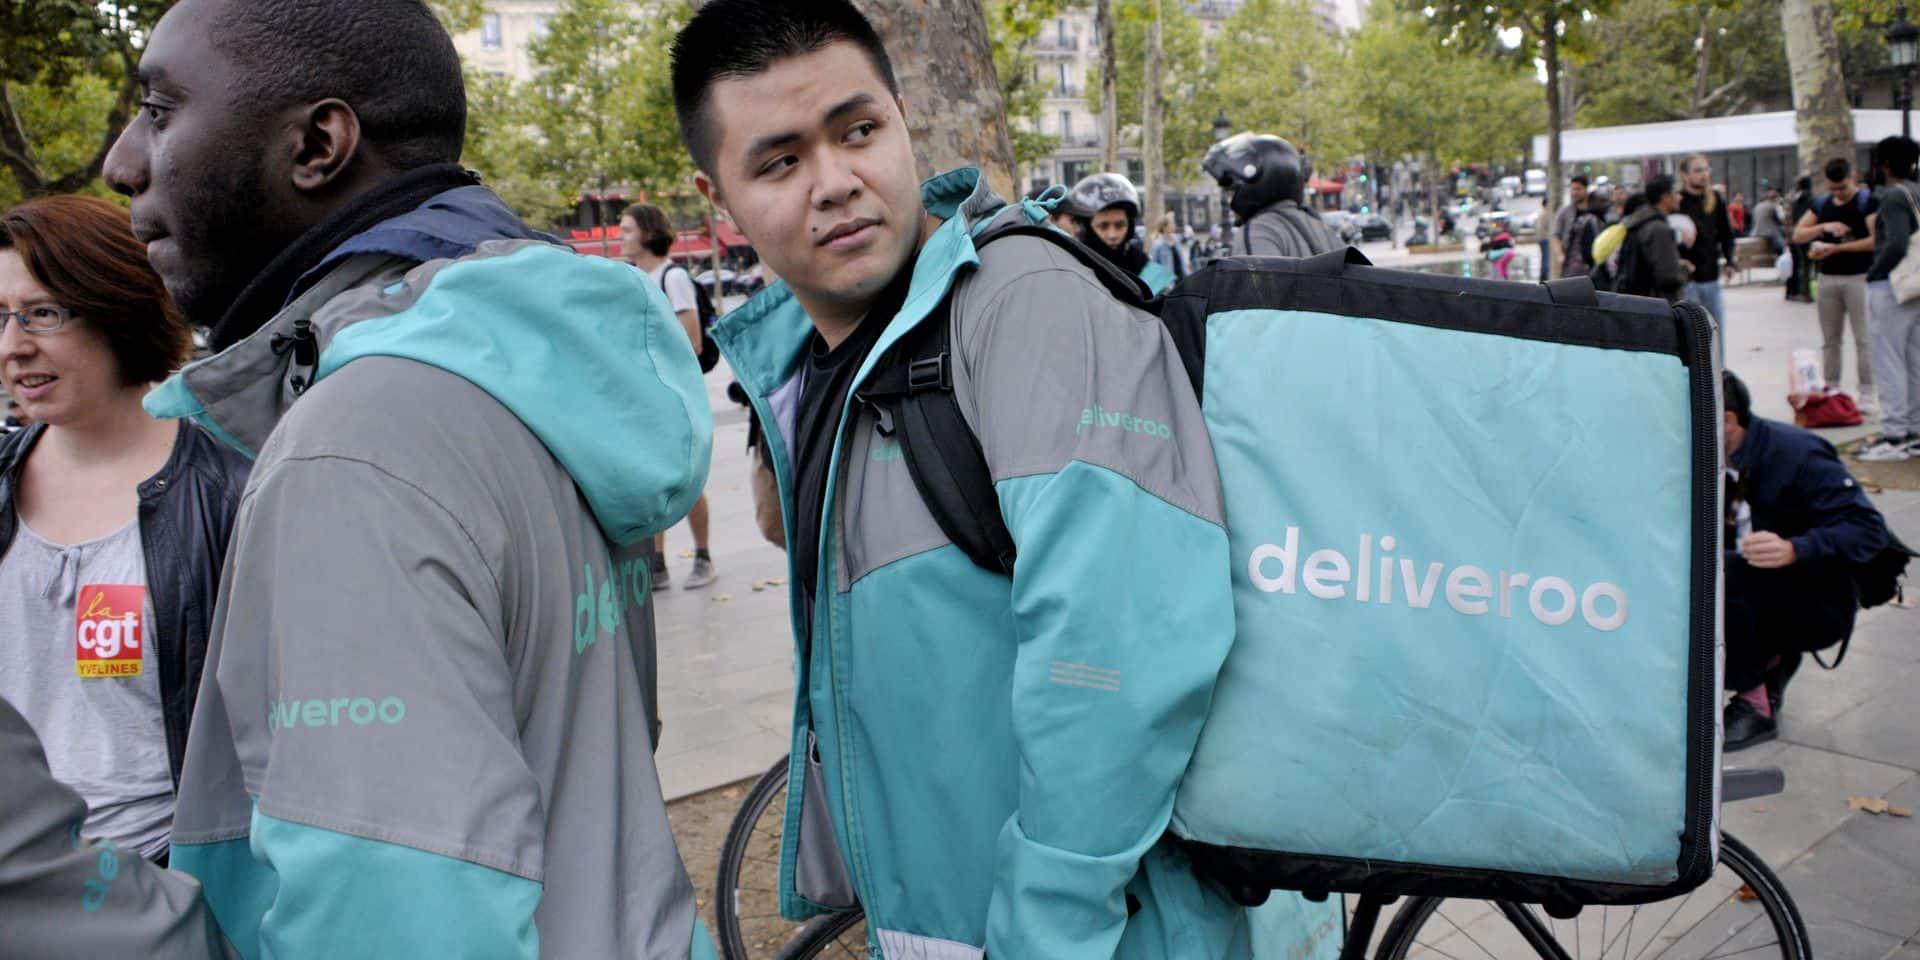 Uber, Deliveroo : tensions salariales, tensions sociétales